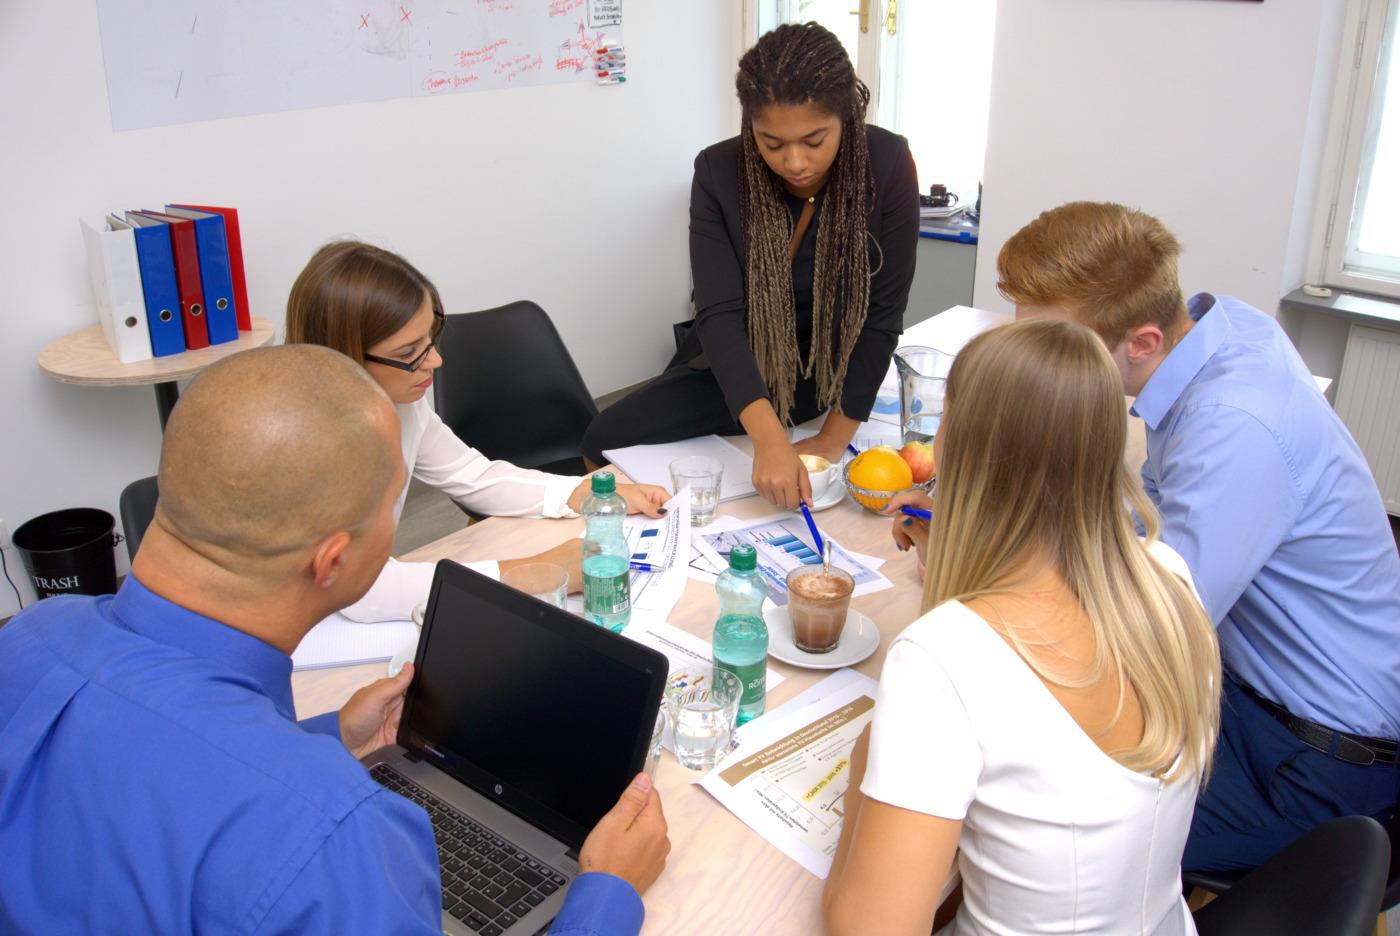 Multikulturelles Team arbeitet gemeinsam